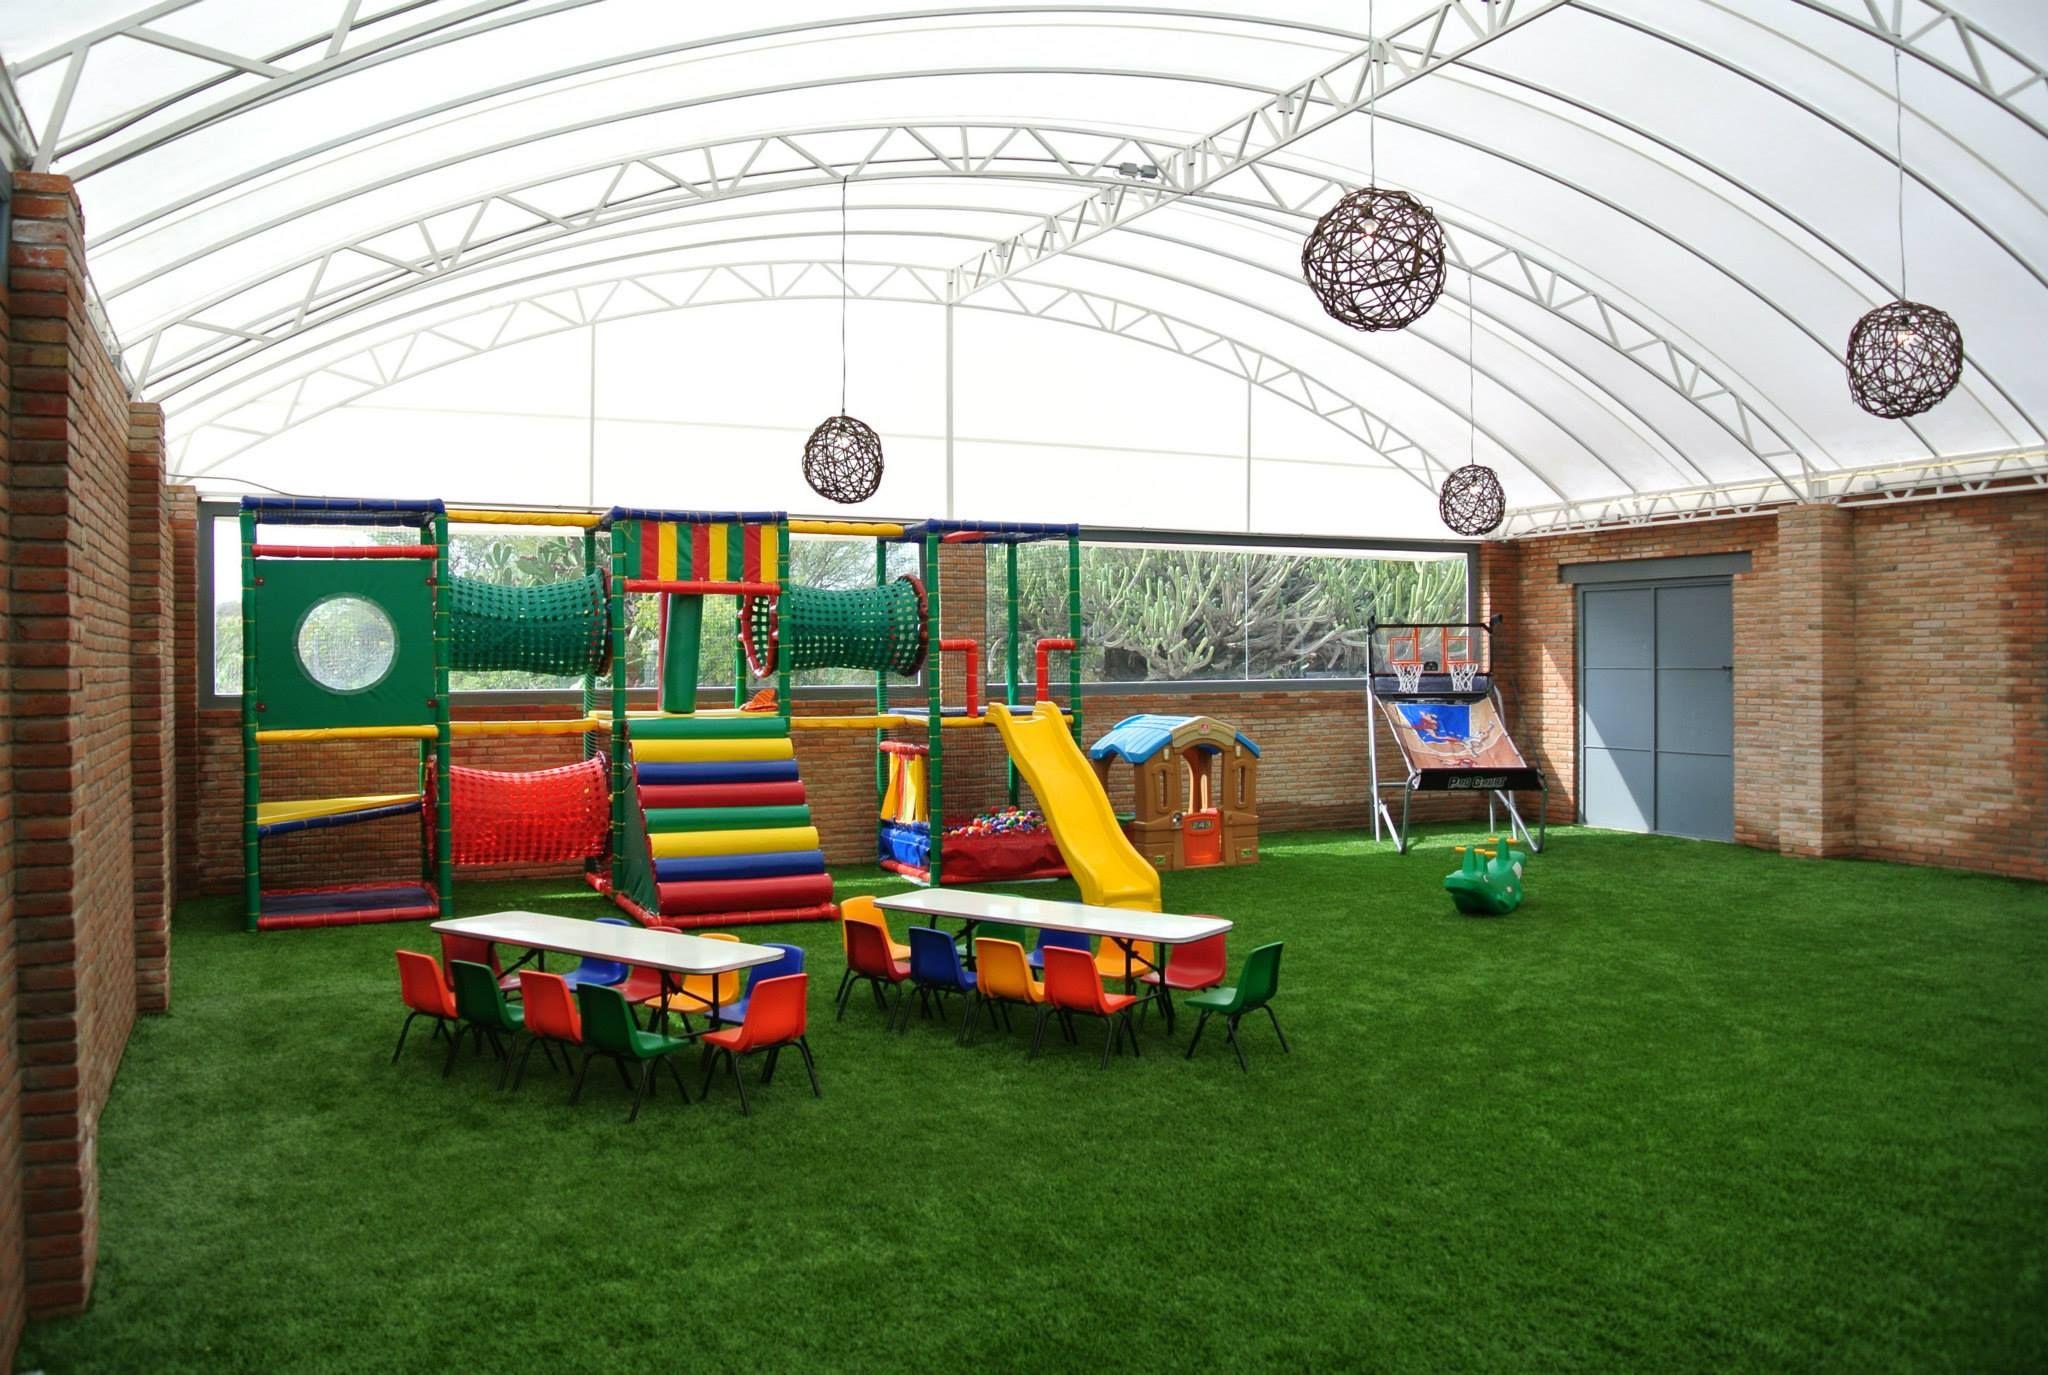 Santa Fe Salon De Eventos Salon De Fiestas Jardin Salon De Eventos Infantiles Salones De Fiestas